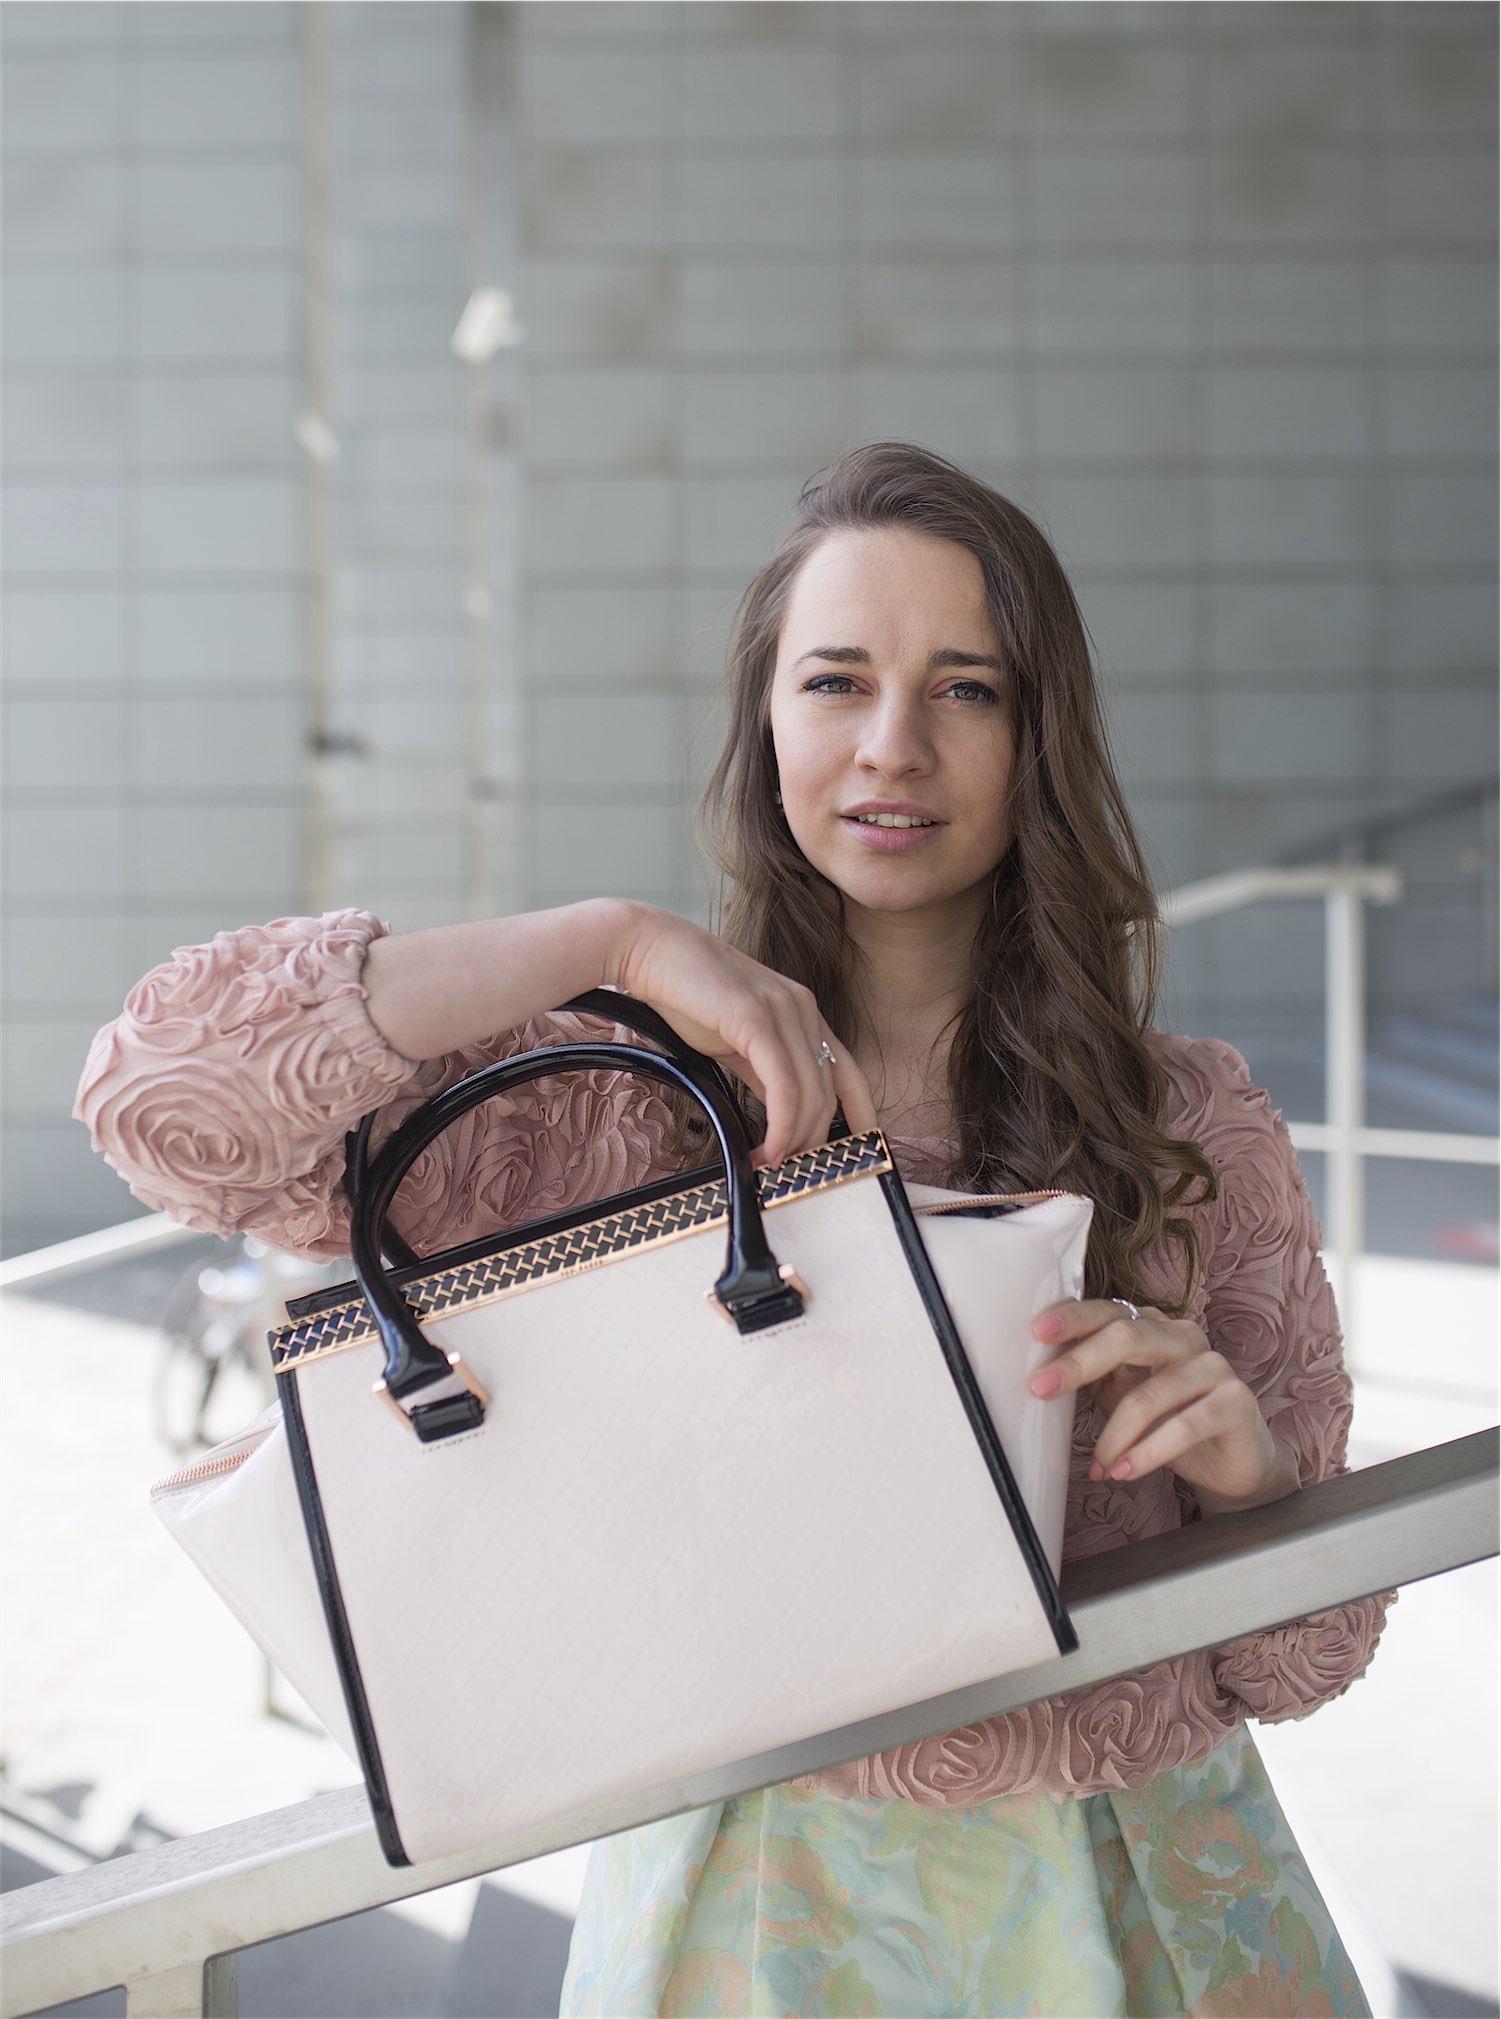 fashion-blogger-kateillustrate-tedbaker-skirt3